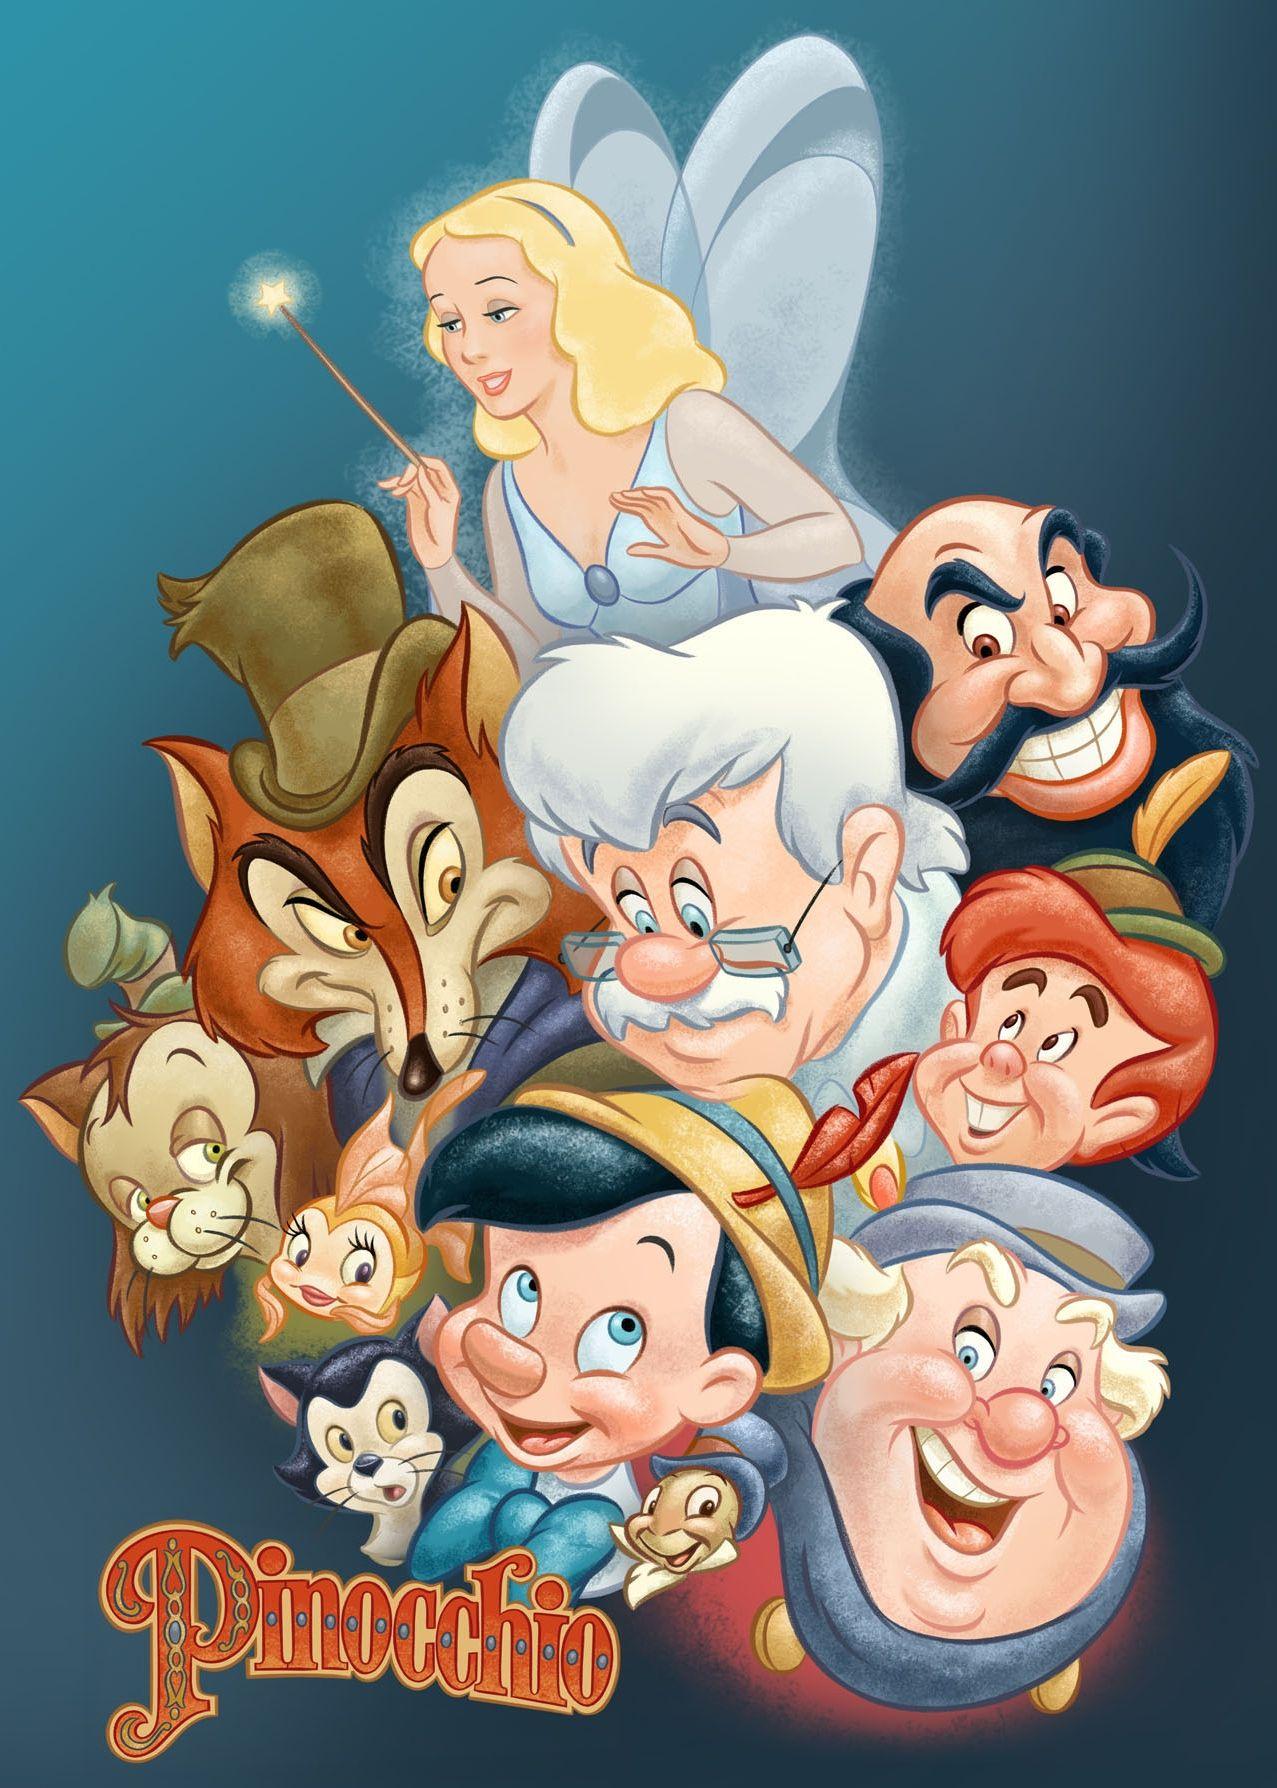 pinocchio by pedro astudillo | cartoon characters | pinterest